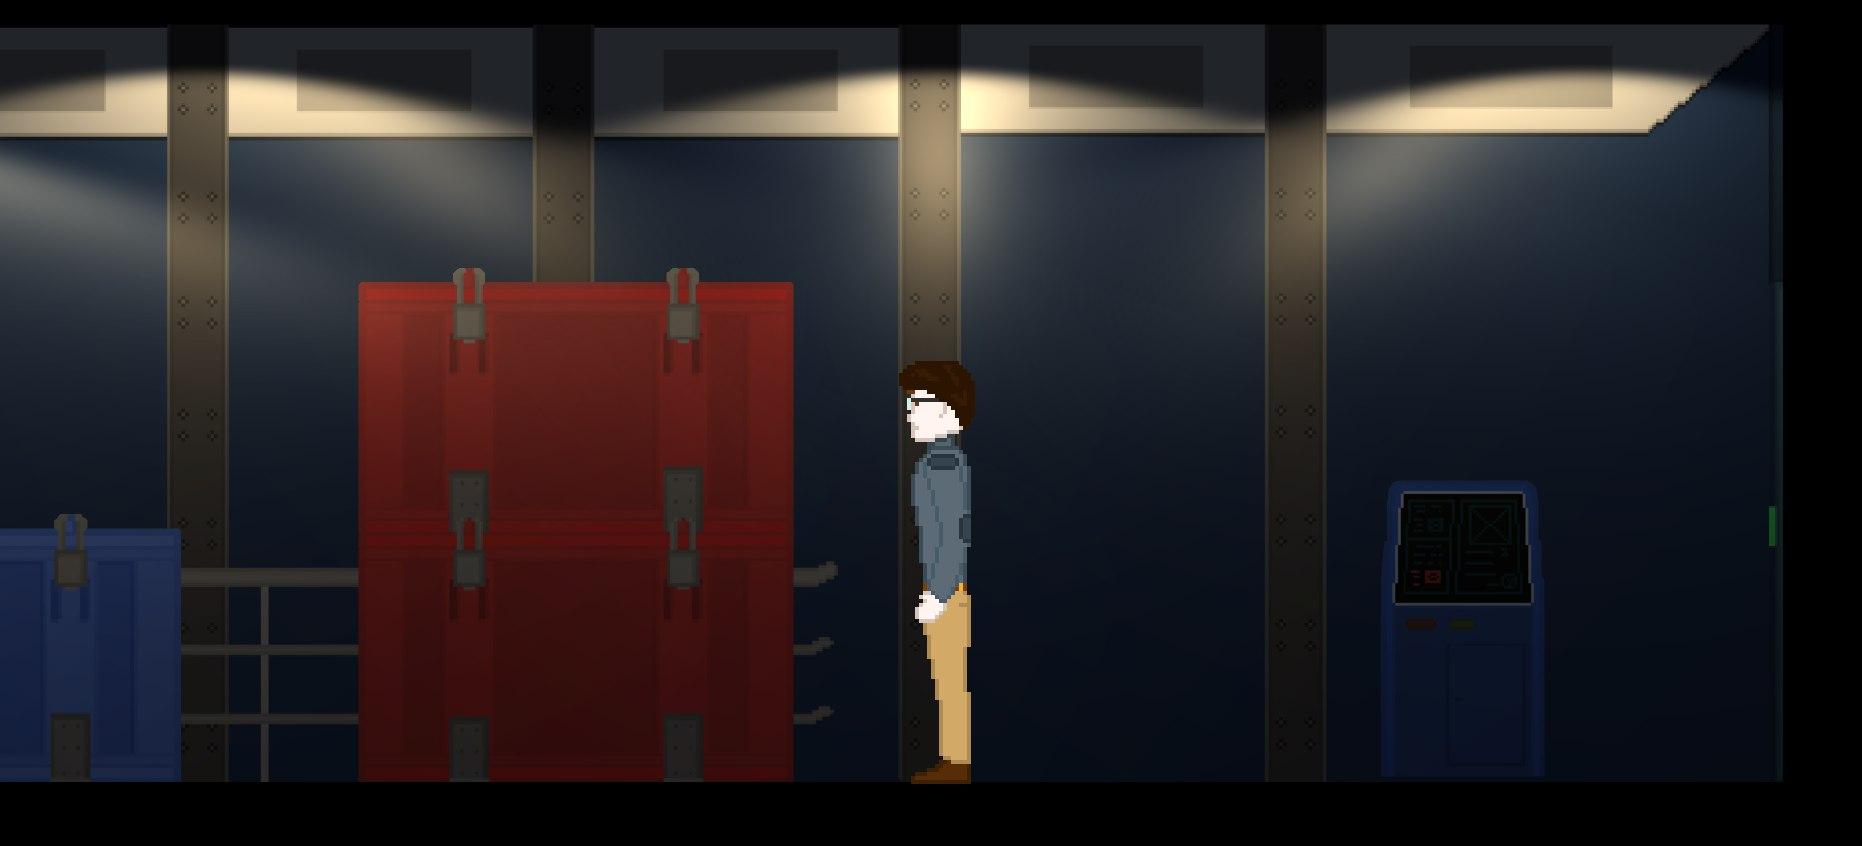 Скрин 2